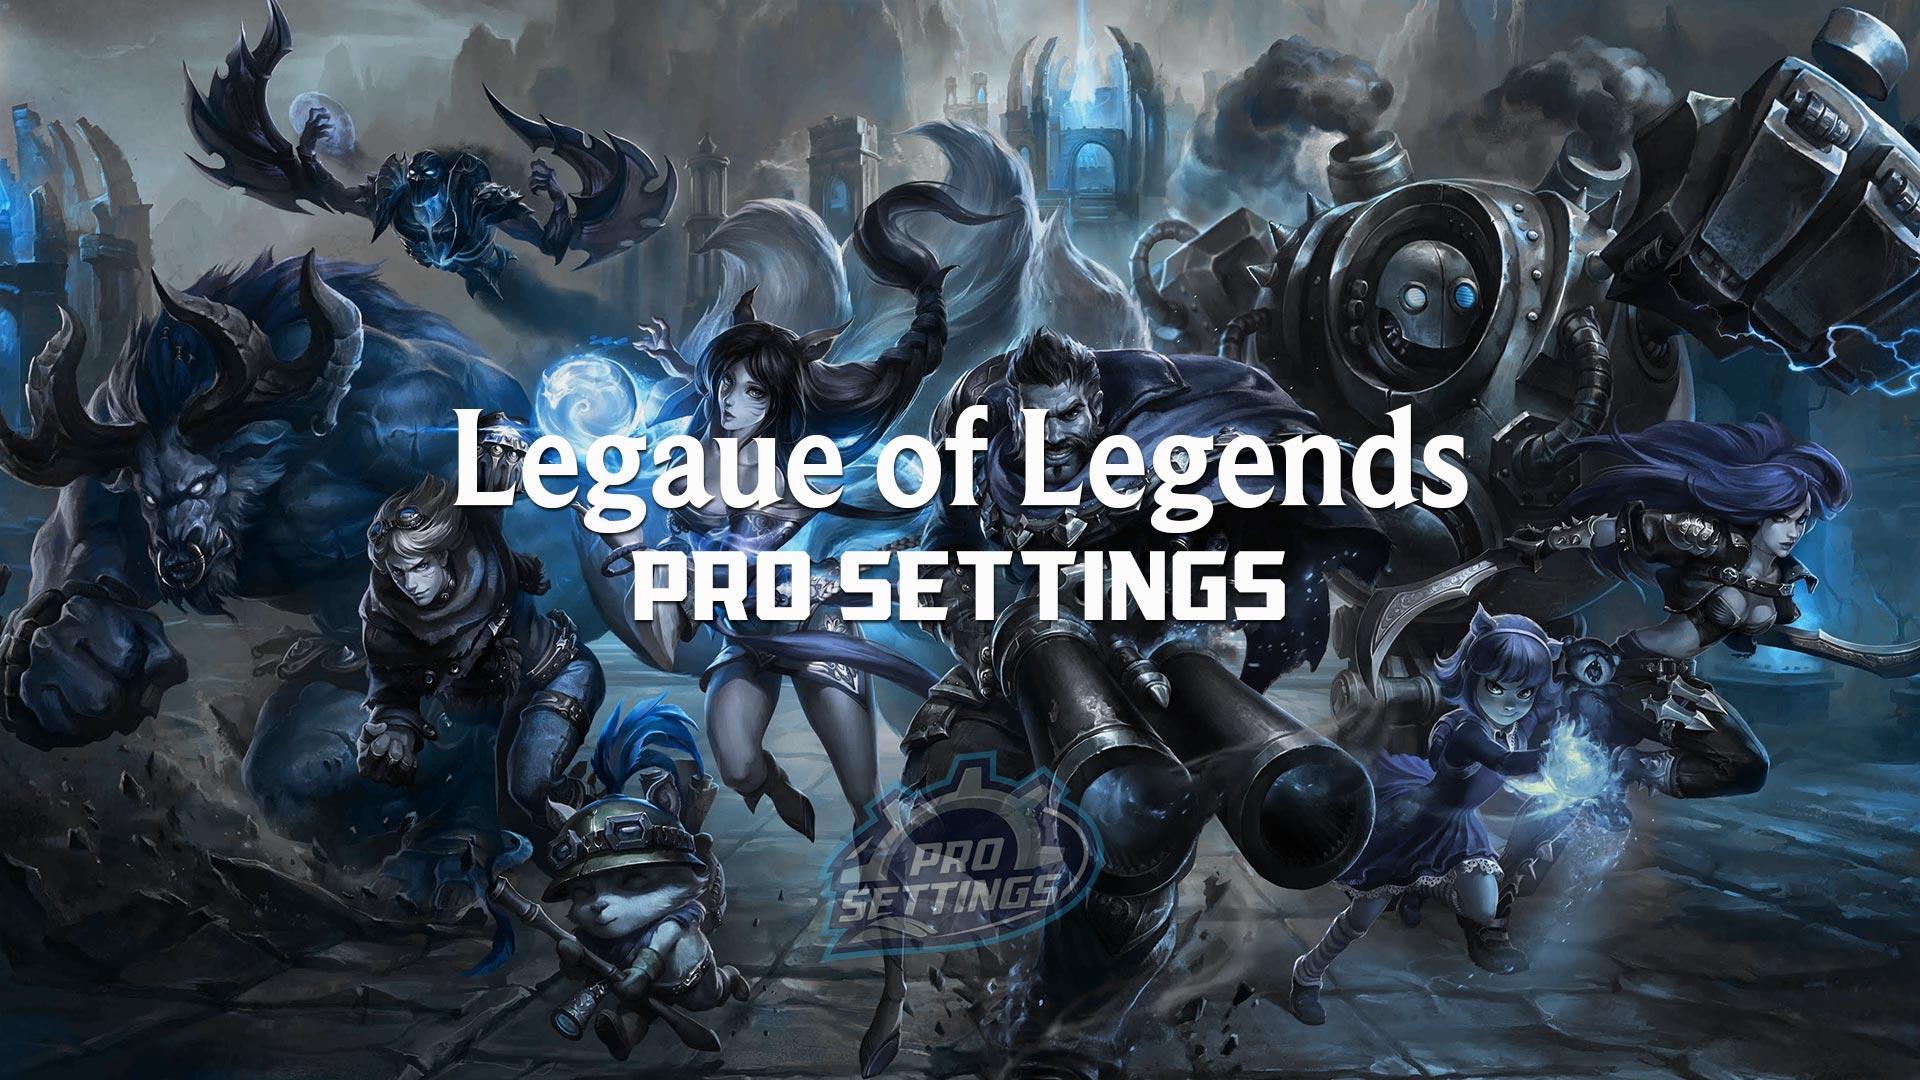 League Of Legends Lol Pro Settings Setup Sensitivity Keybinds 2021 Sensitivity, dpi, resolution, crosshair, monitor, mouse, keyboard and headset. league of legends lol pro settings